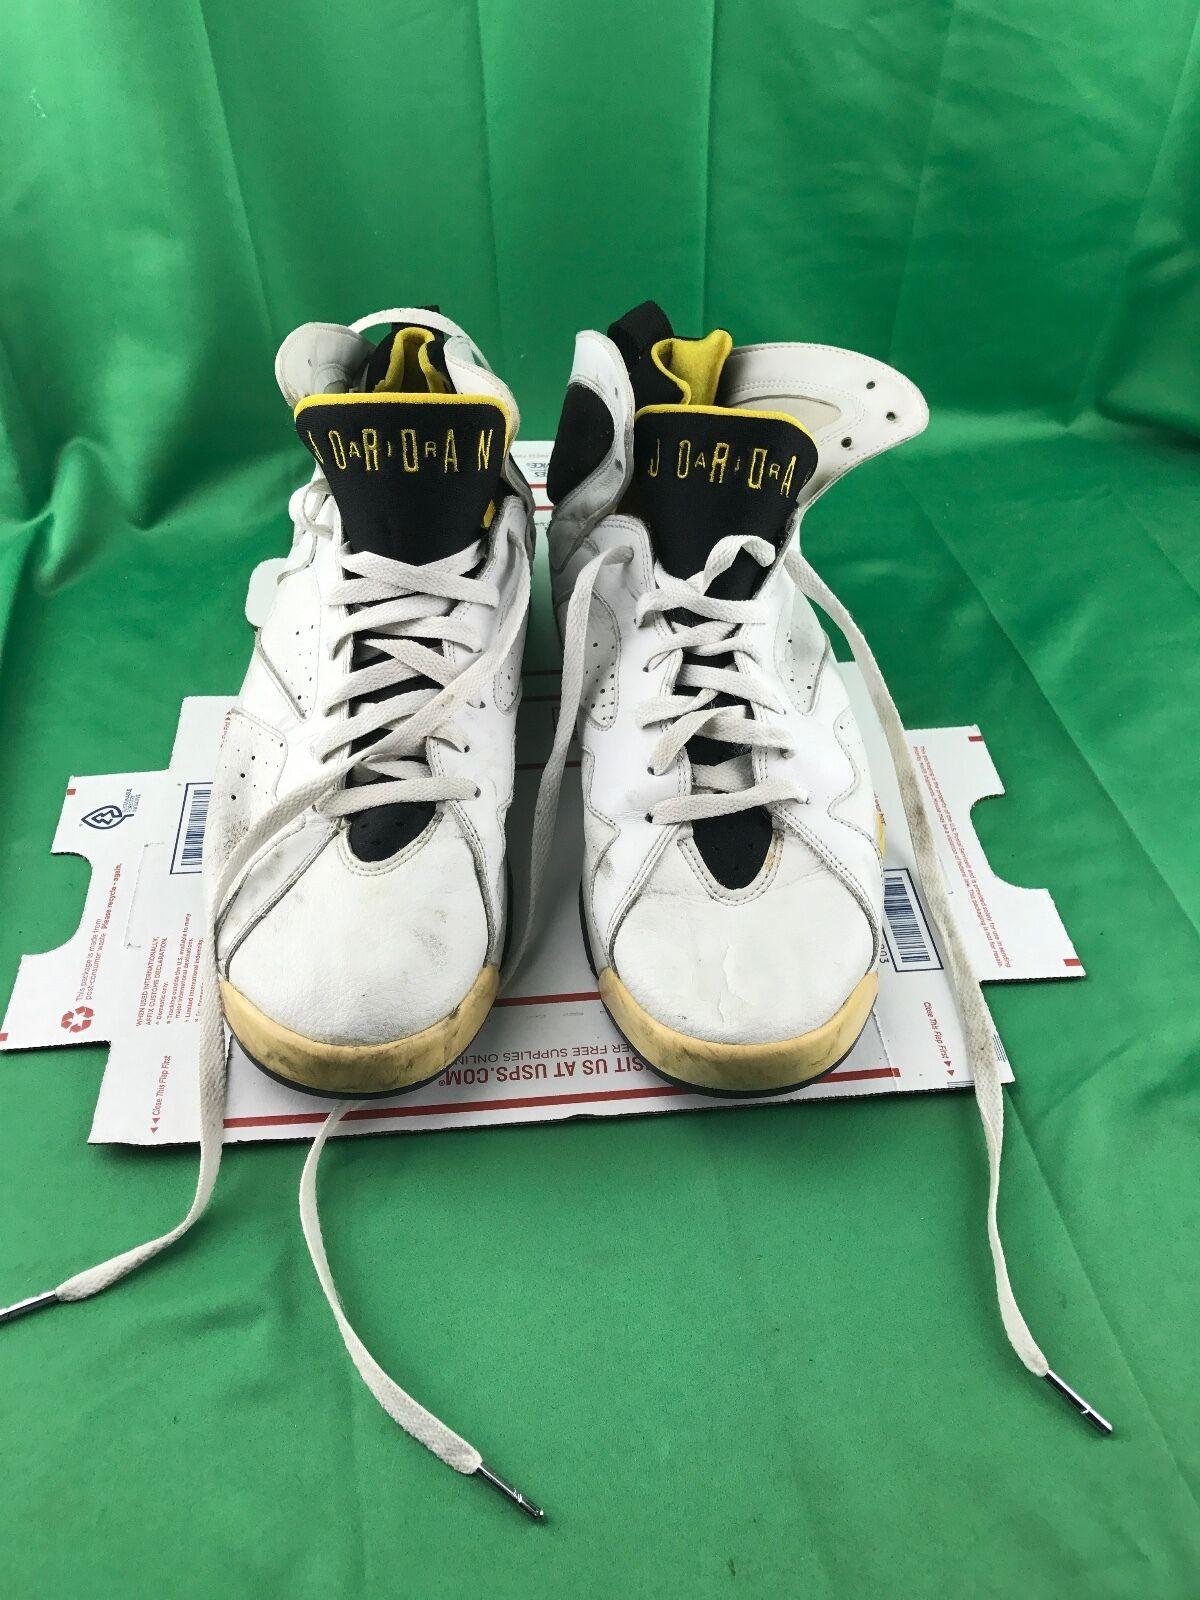 2005 Nike Air Jordan Retr Vii 7 Donne Ci Ci Donne Bianco Gialla 313358-172 Numero 13 b71d23